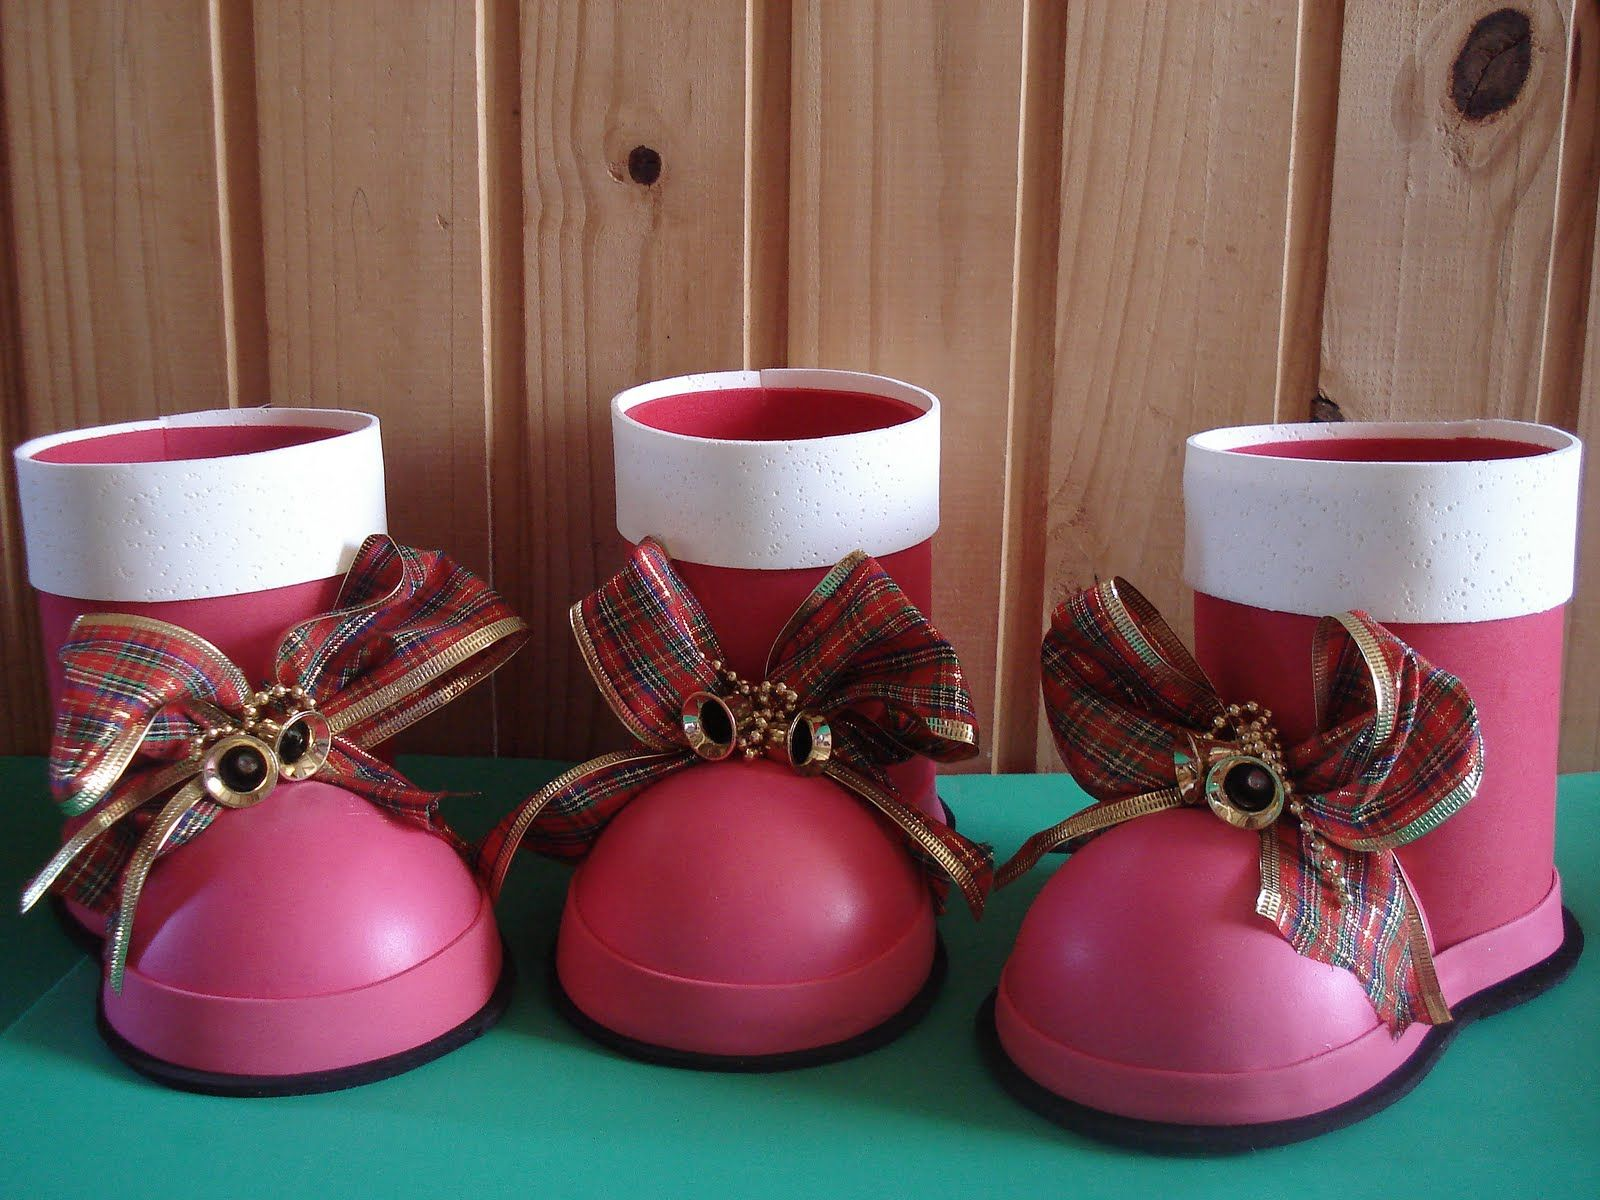 Bota de natal artesanal feita com garrafa pet vermelha